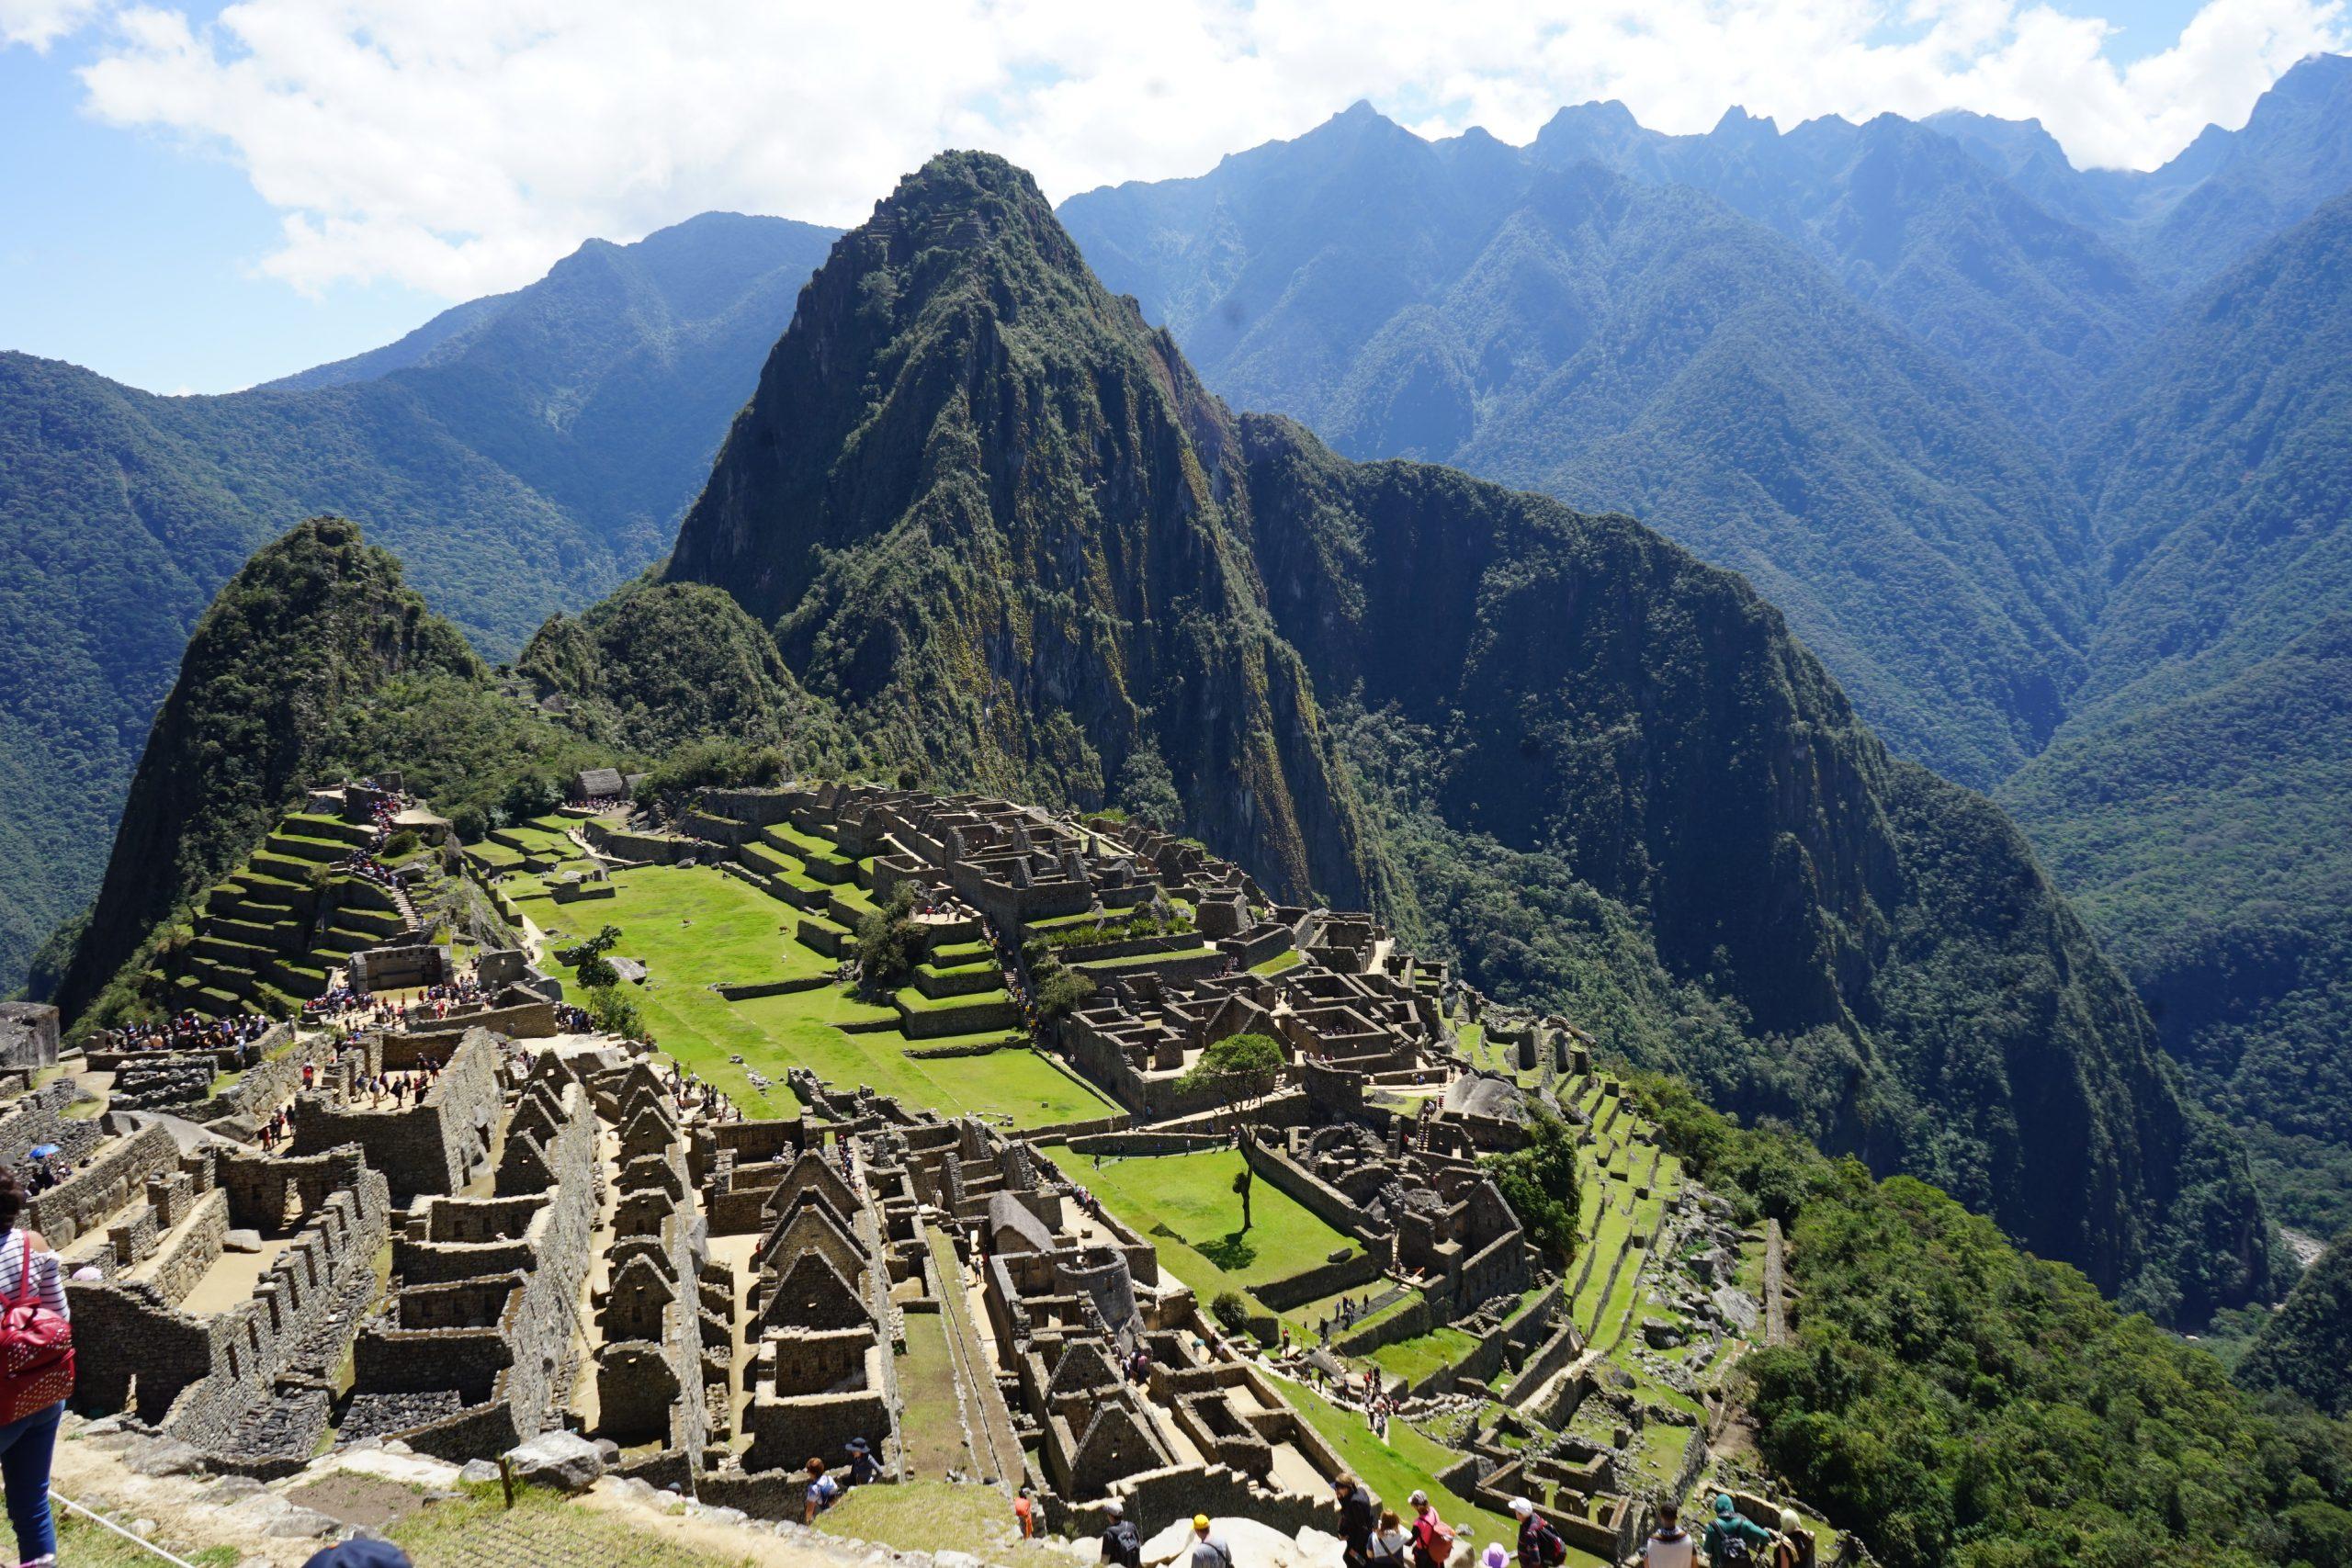 Subida Al Machu Picchu Y Huayna Picchu Entradas 2020 Mundus13